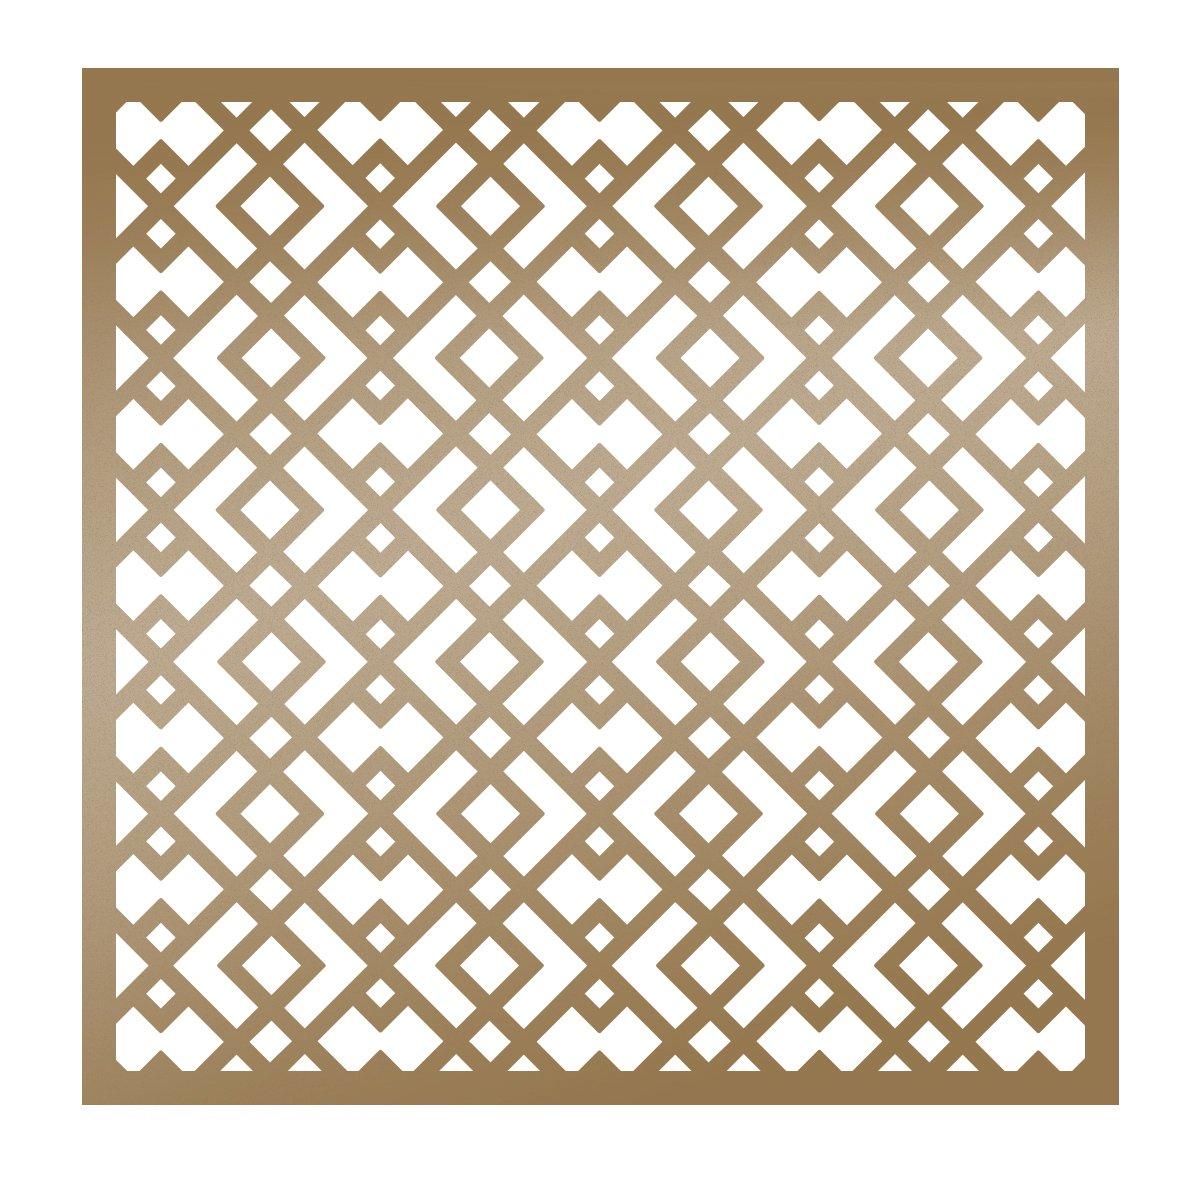 Artdeco Creations ULT157831 Ultimate Crafts The Ritz Stencil 6X6-Geometric